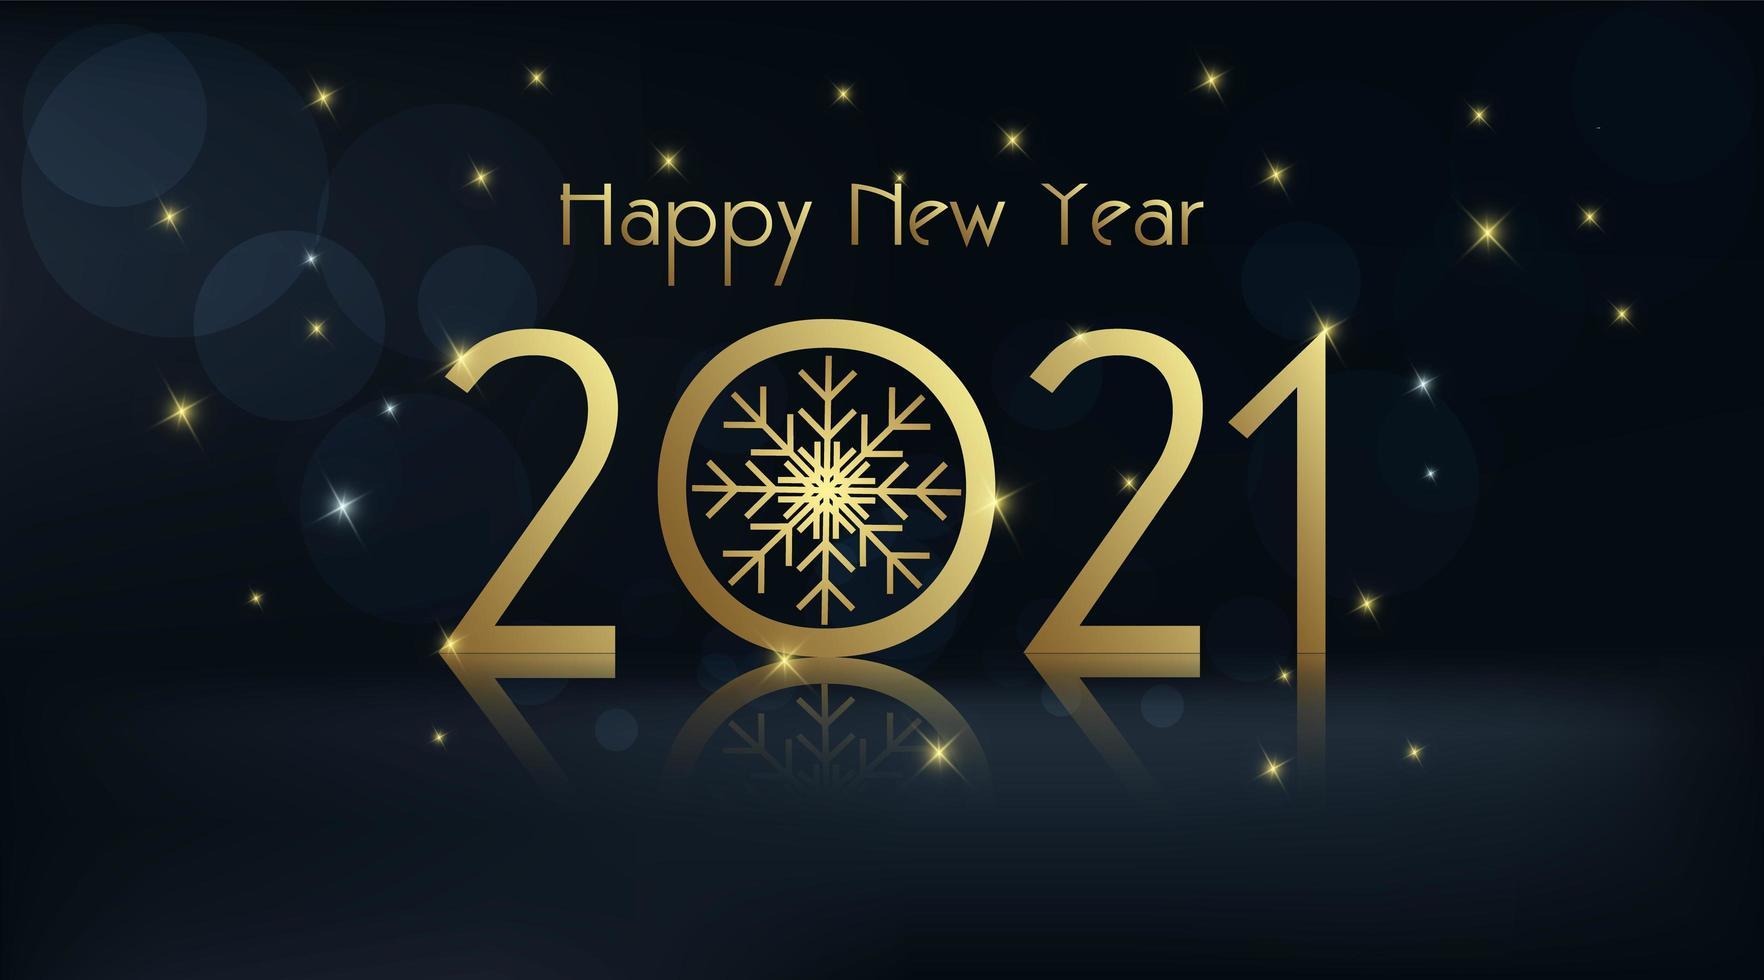 Happy New year 2021 on dark background vector